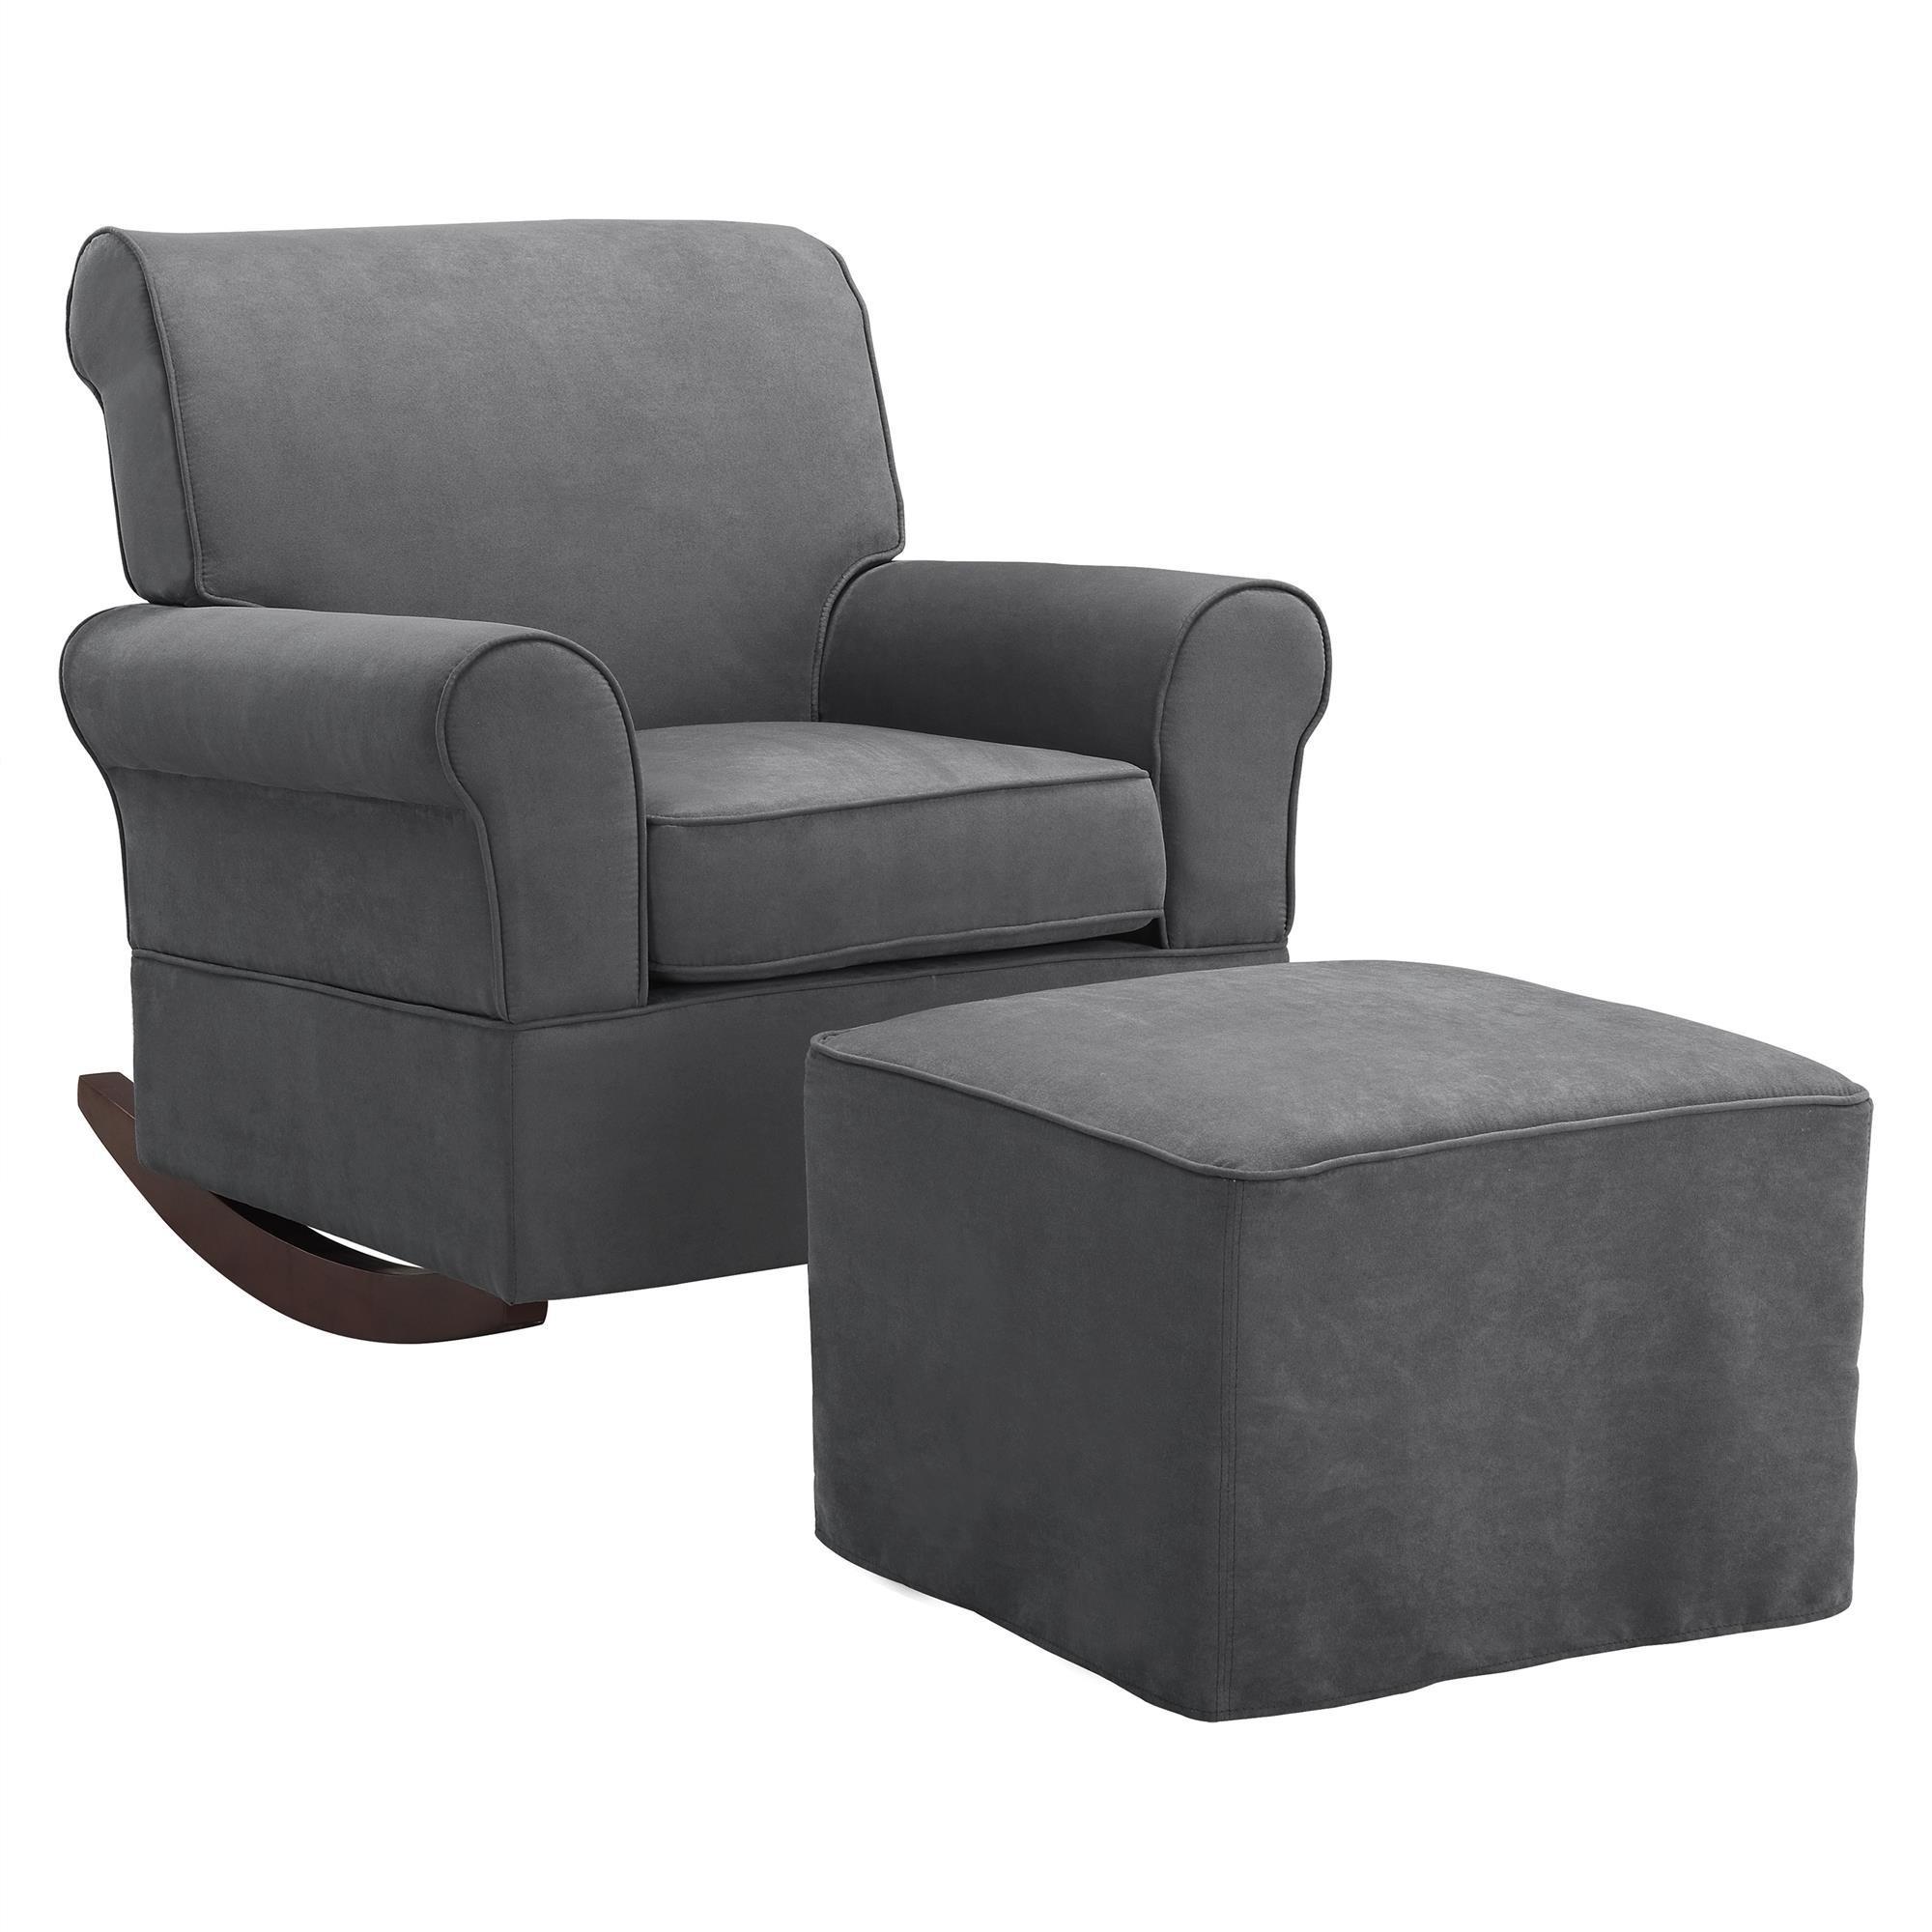 baby relax the mackenzie microfiber plush nursery rocker. Black Bedroom Furniture Sets. Home Design Ideas